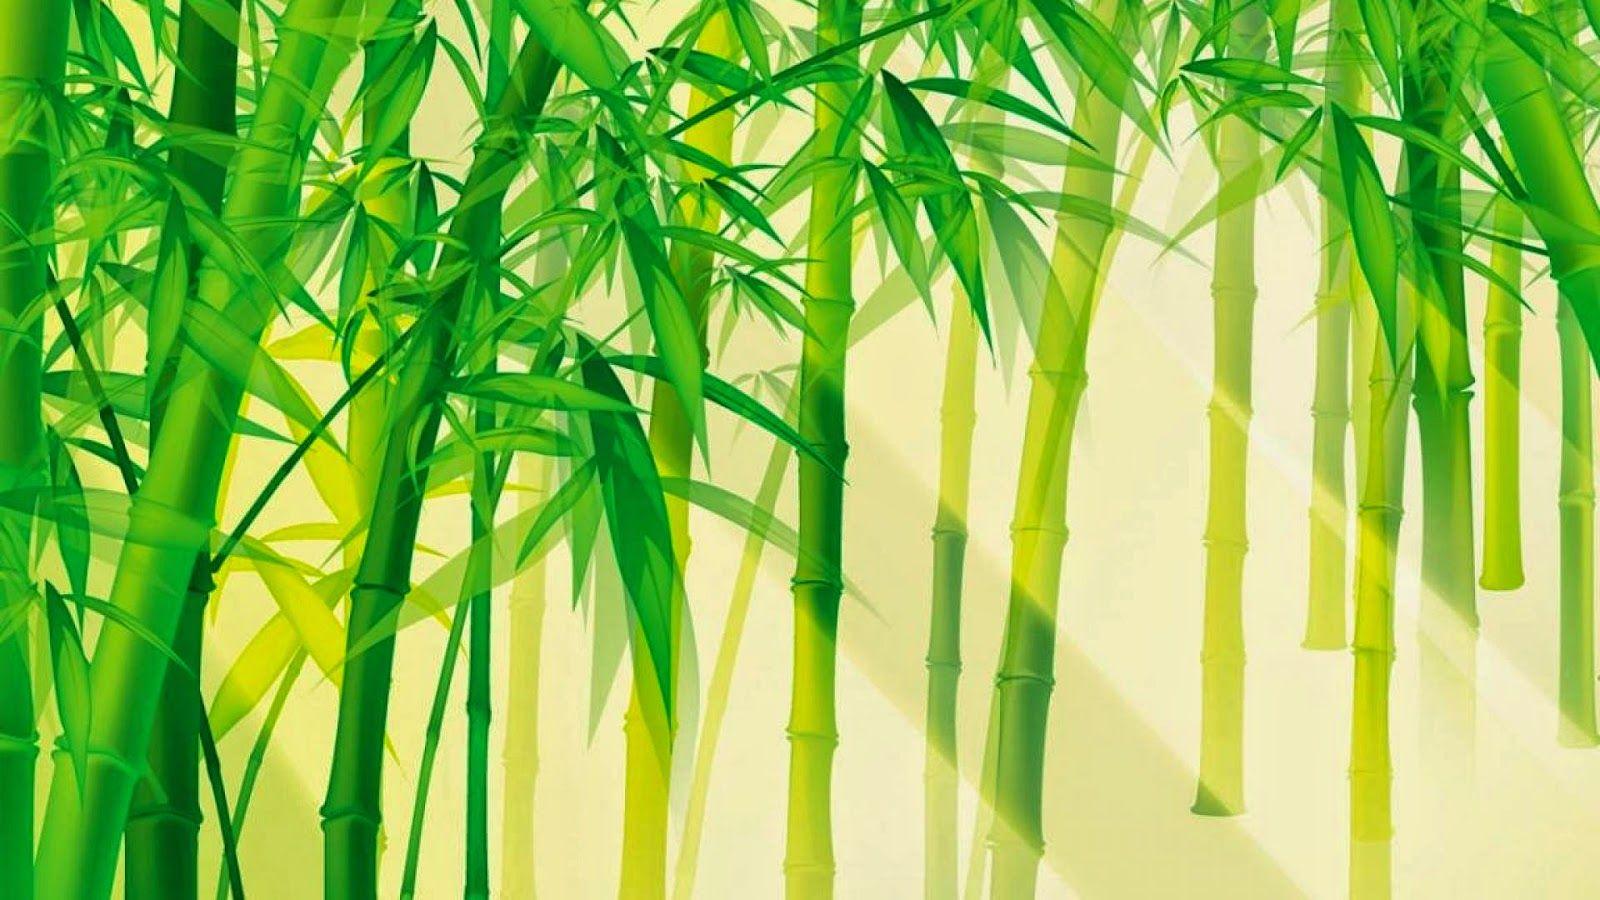 Pin By Lan Amb On Khan Mat Canvas Drawings Bamboo Background